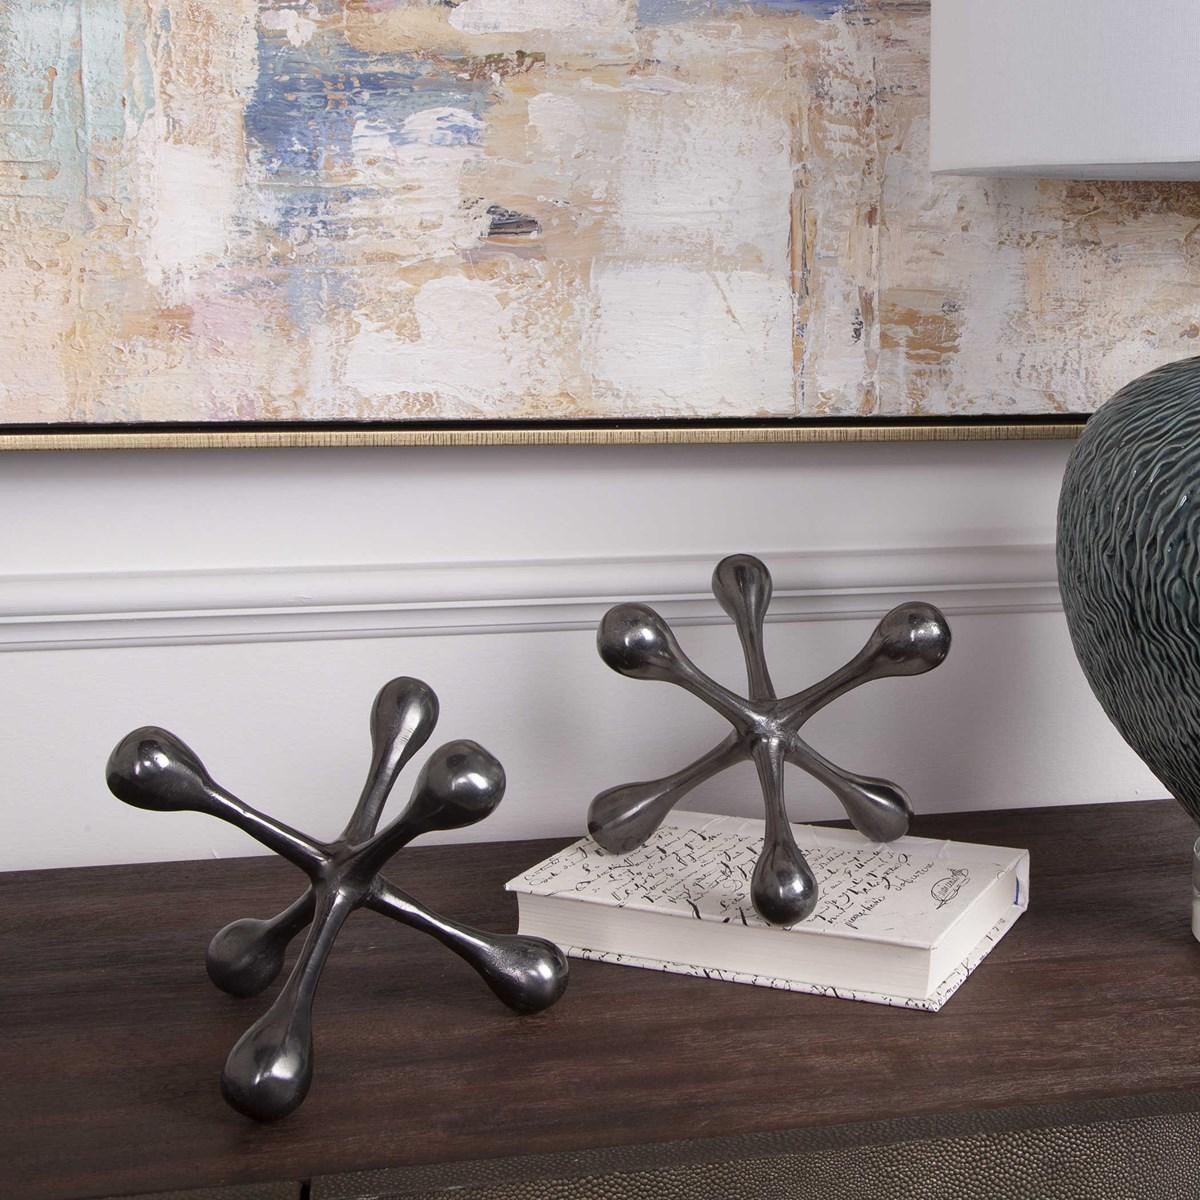 Harlan Black Nickel Objects, S/2